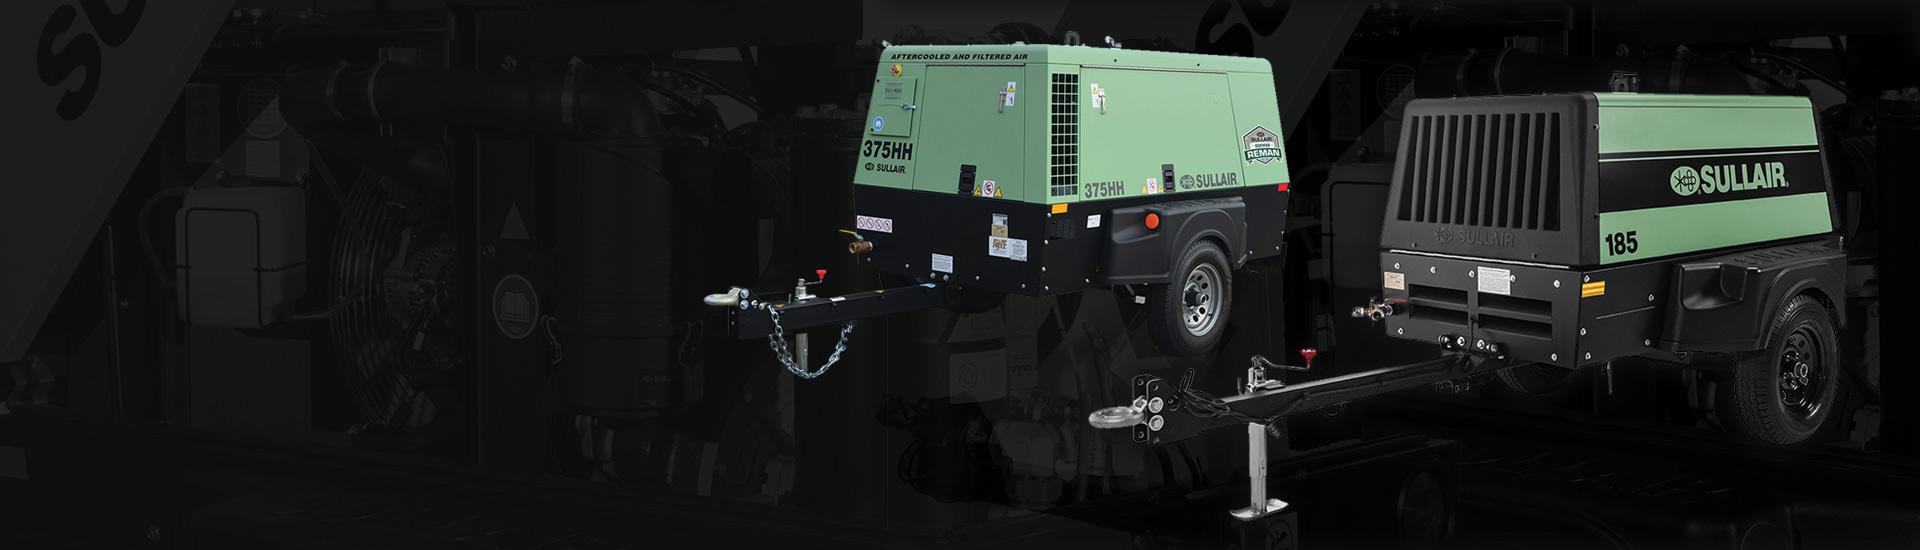 Home Sullair Tank Truck Manufacturer Air Schematic Durability